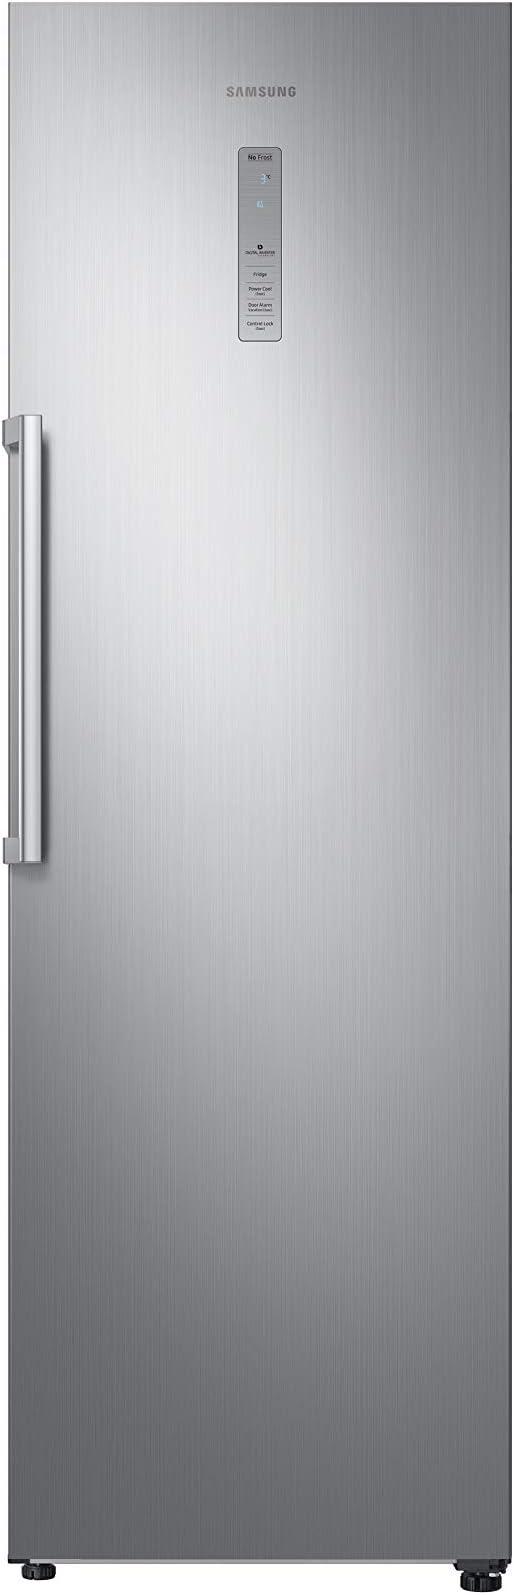 Oferta amazon: Frigorífico Twin Inox 185 A++ 385L RR39M7165S9           [Clase de eficiencia energética A++]